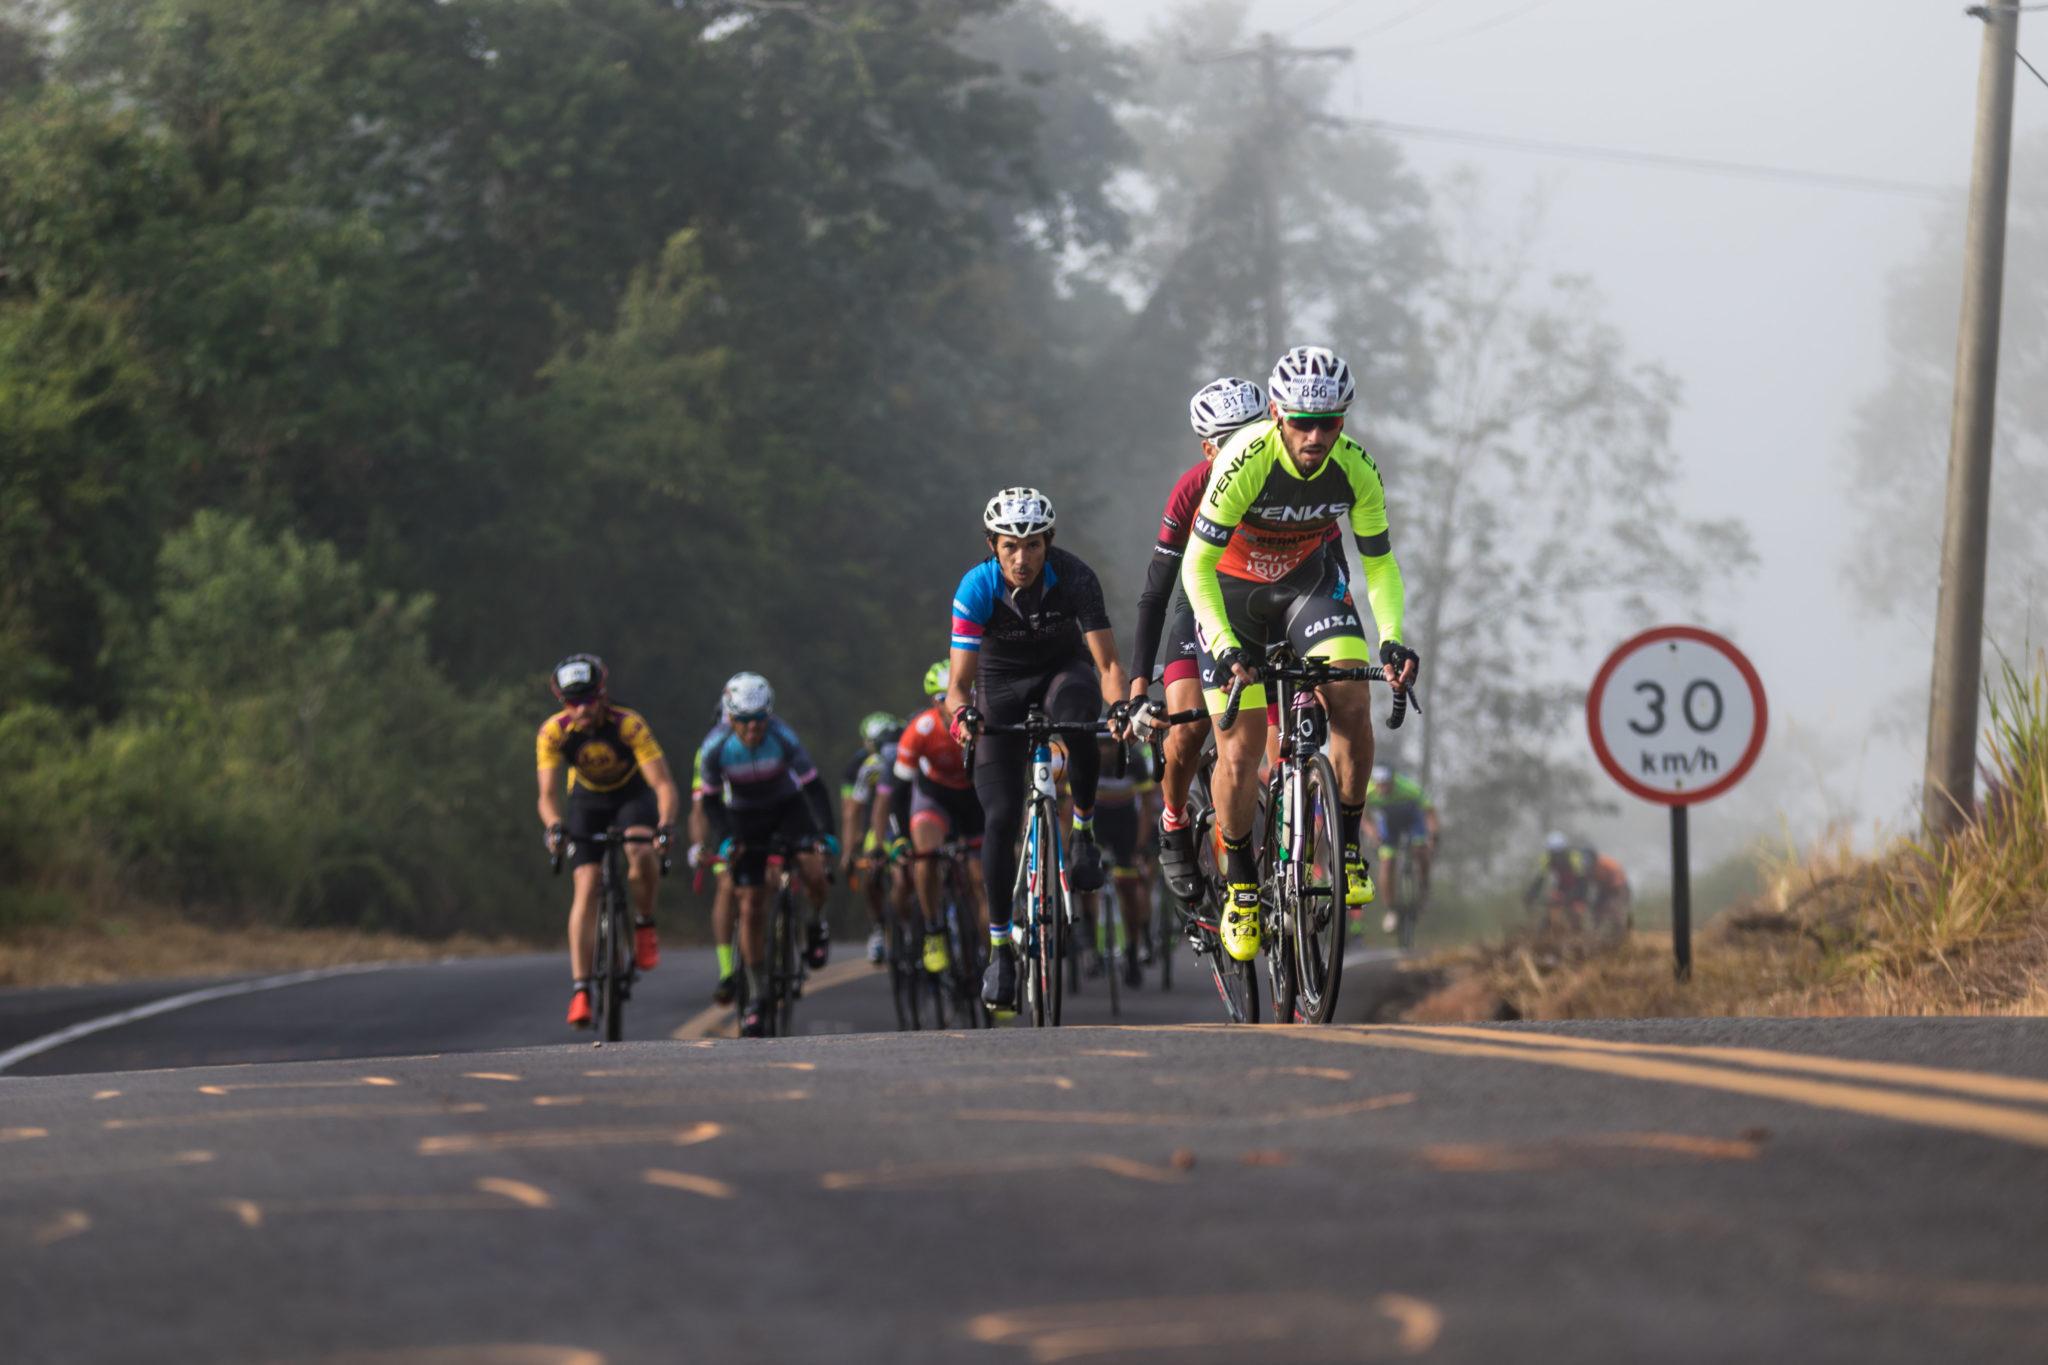 Sidnei Fernandes inicia ataque (Wladimir Togumi / Brasil Ride)